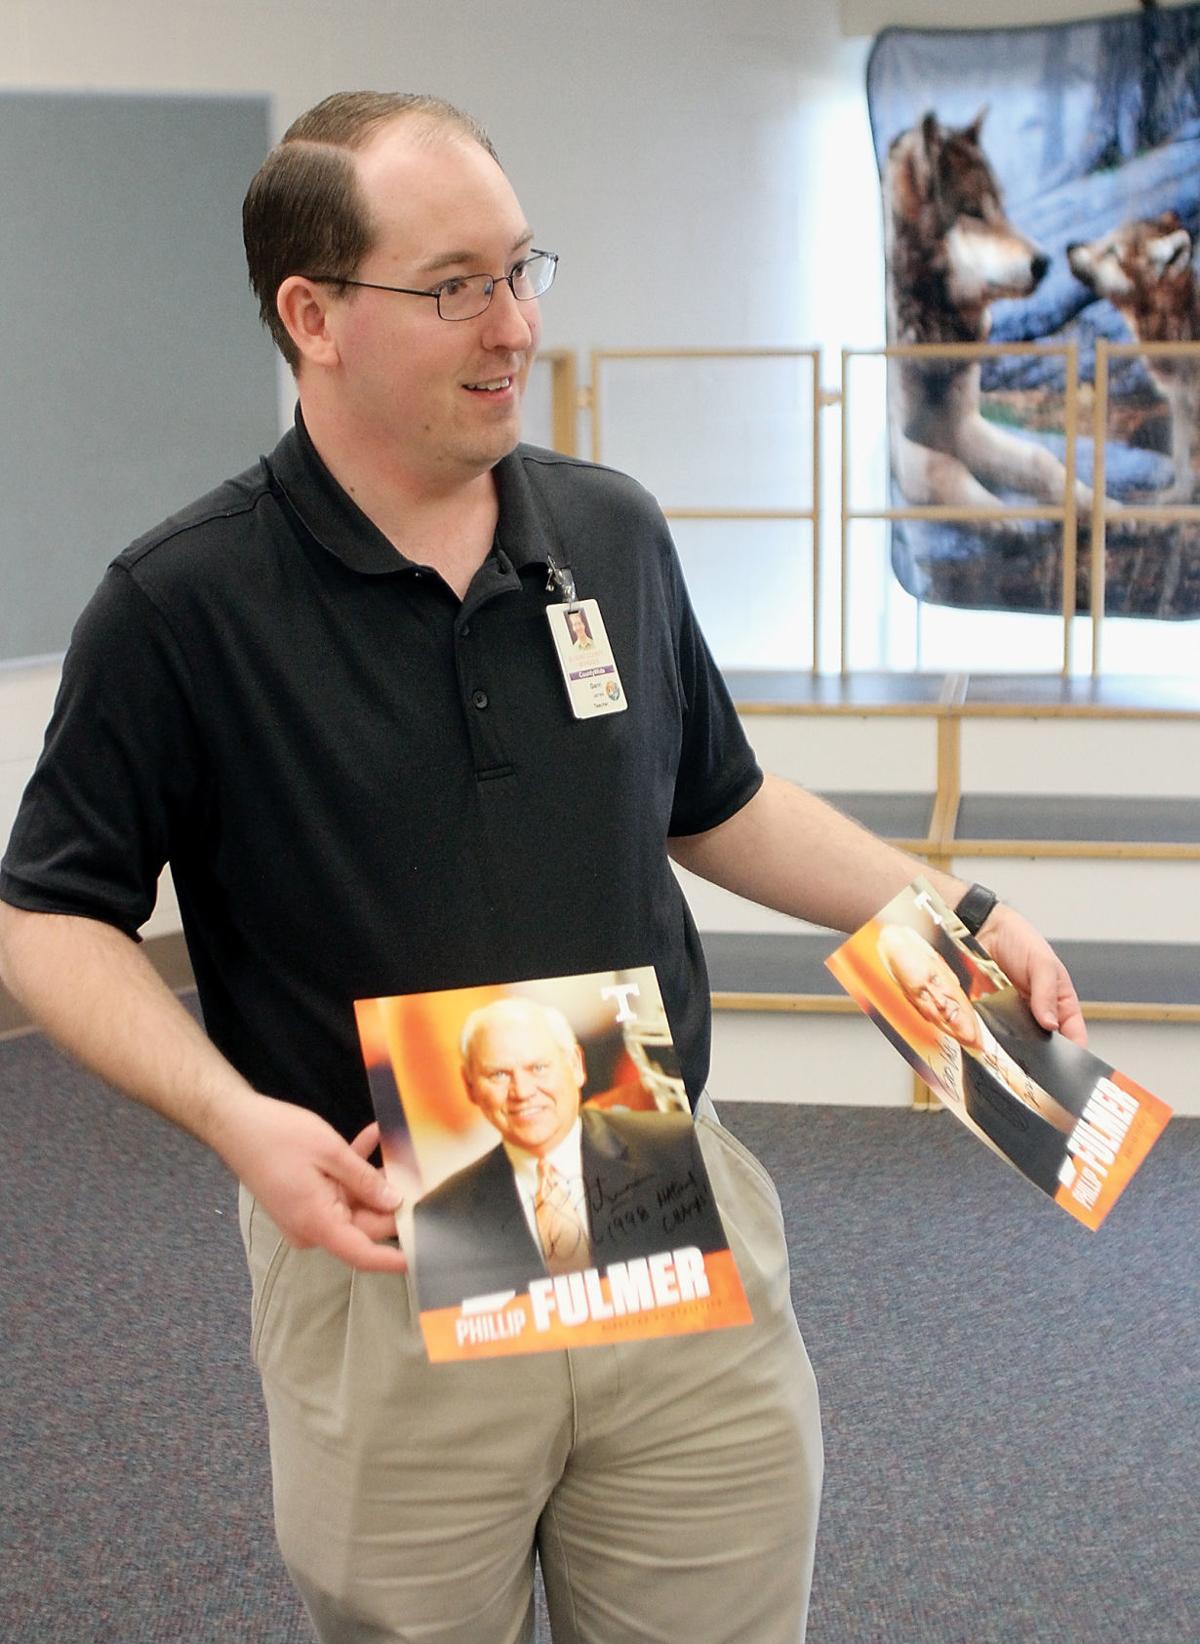 Music teacher James Gann shows two autographed photos of Phillip Fulmer